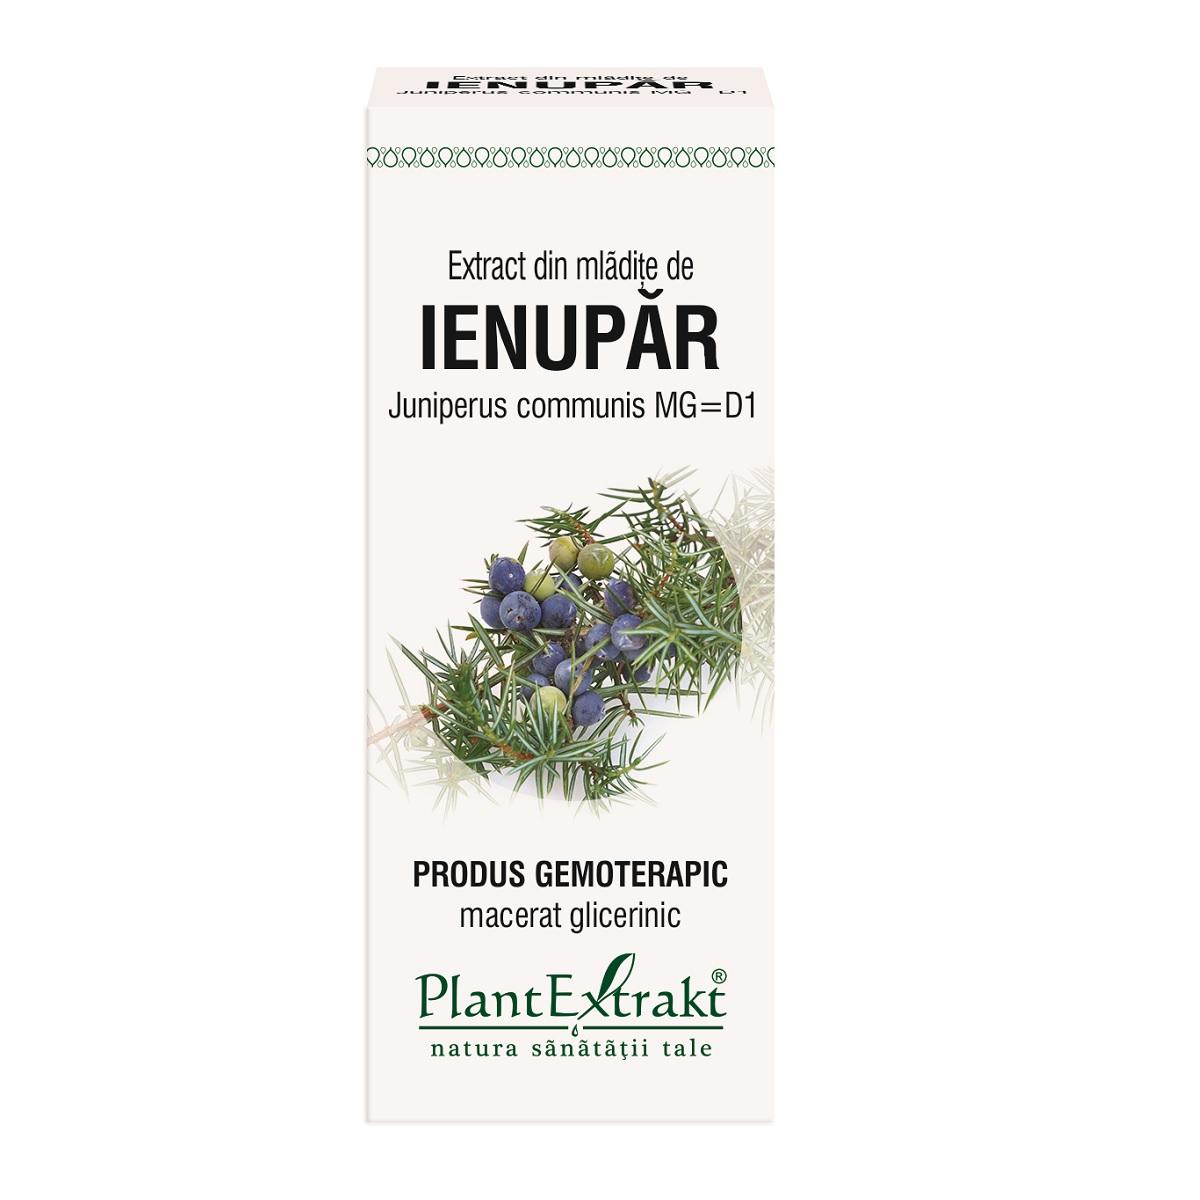 Extract din mladite de Ienupar, 50ml, PlantExtrakt drmax.ro